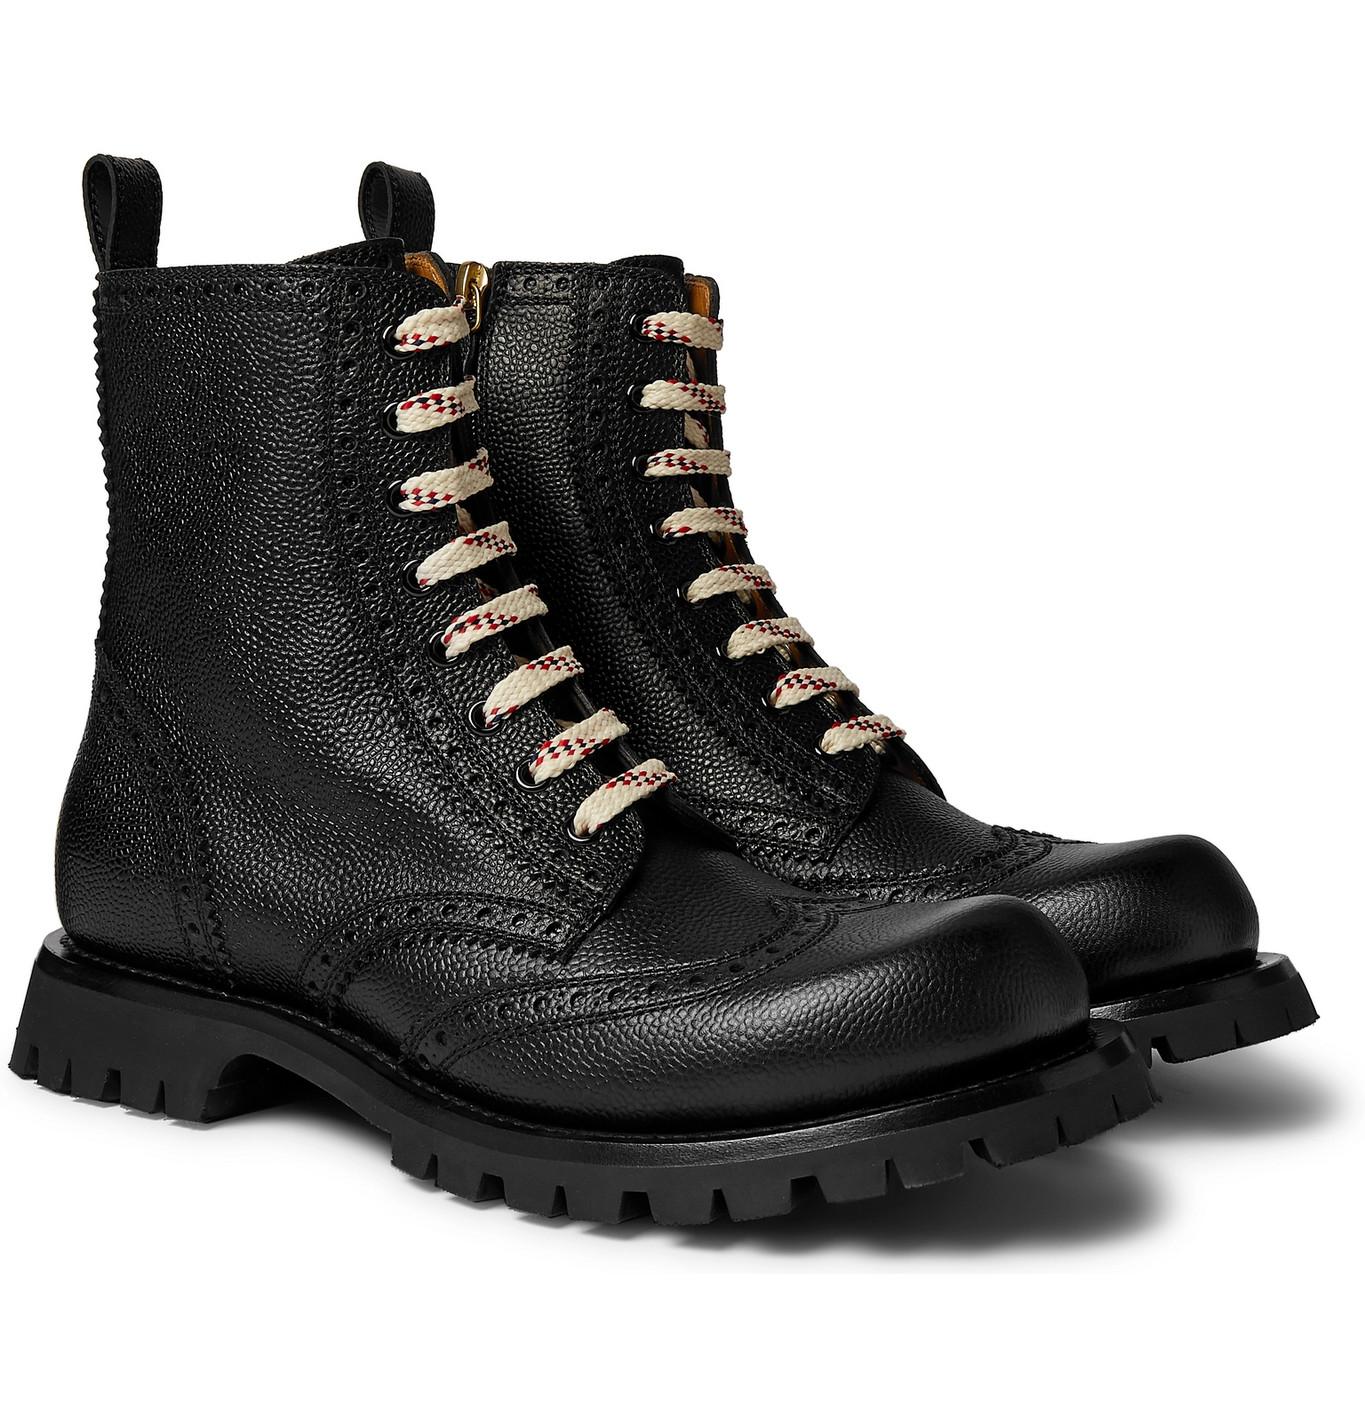 New Arley Pebble-Grain Leather Brogue